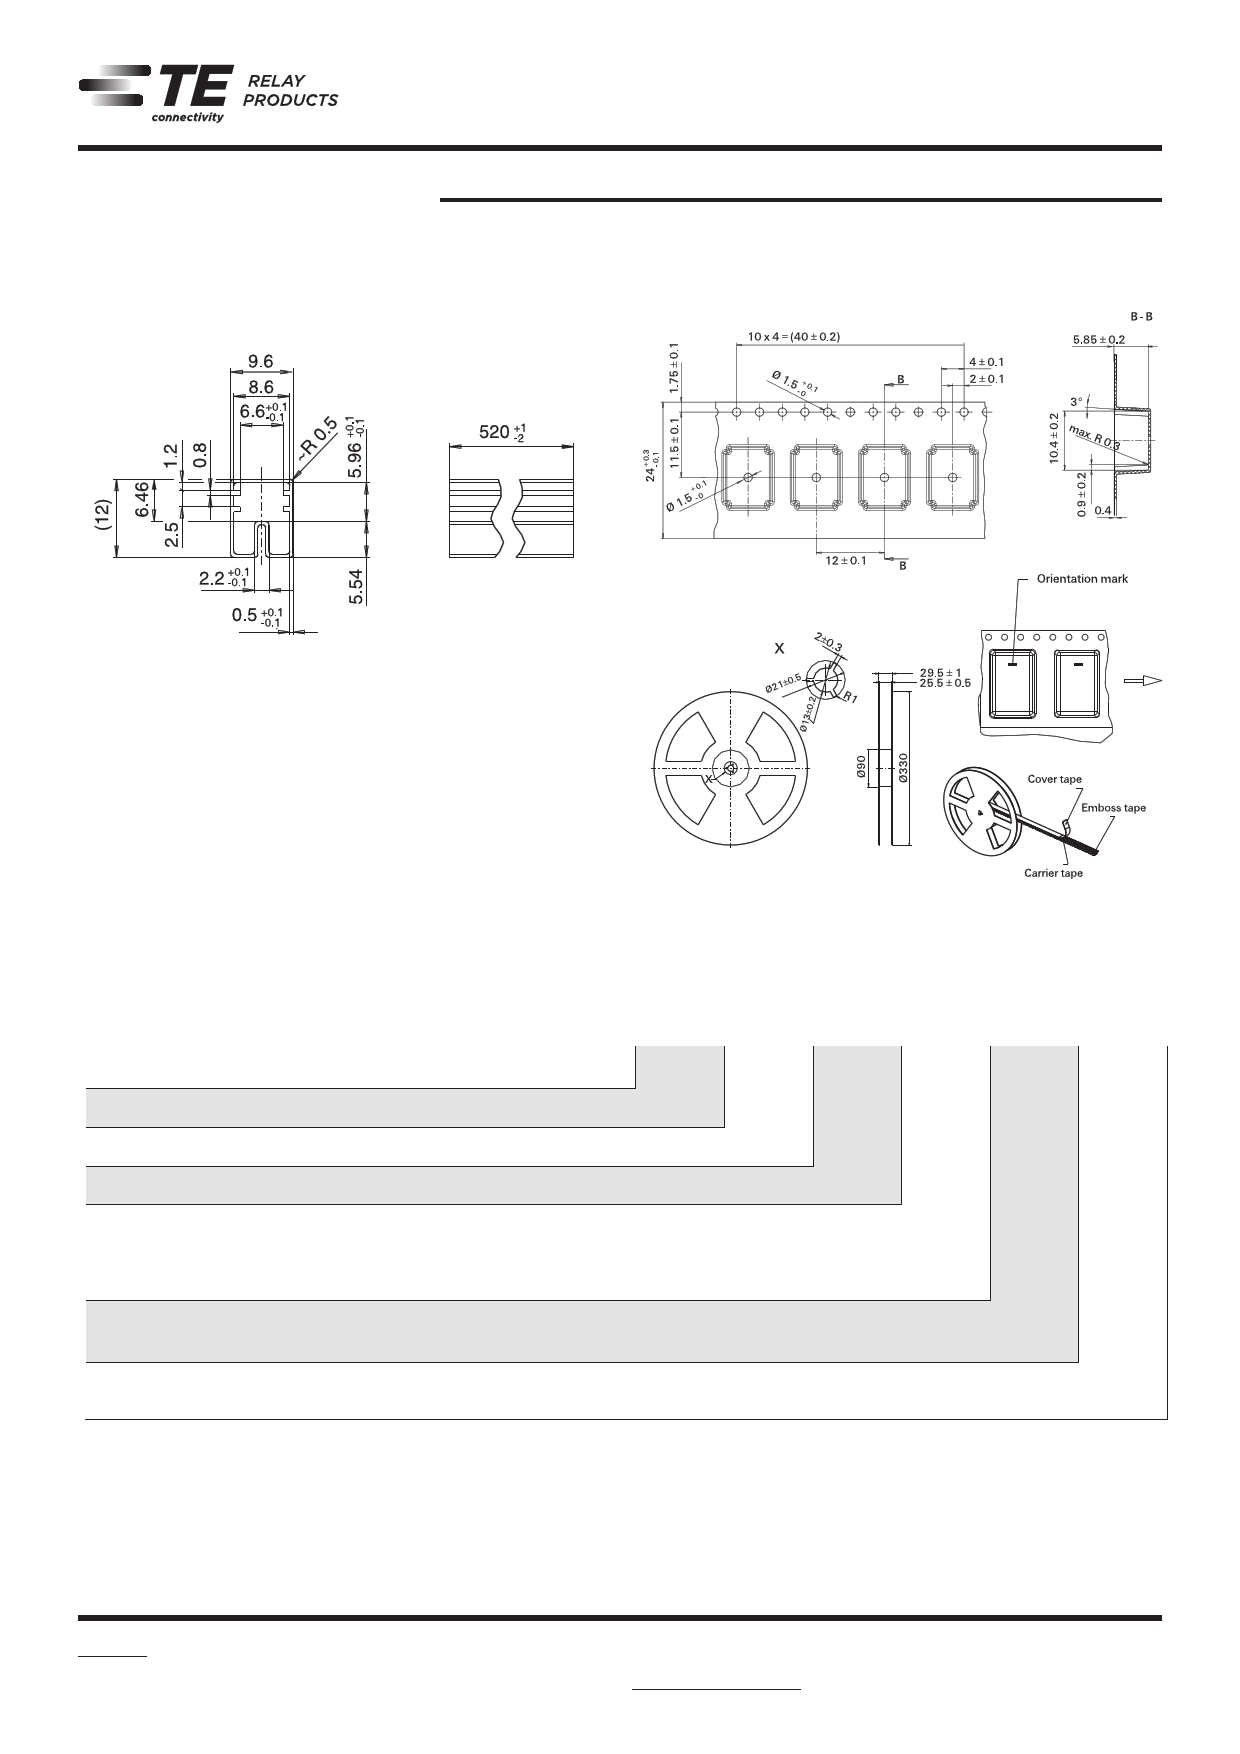 5-1462037-6 pdf, 반도체, 판매, 대치품